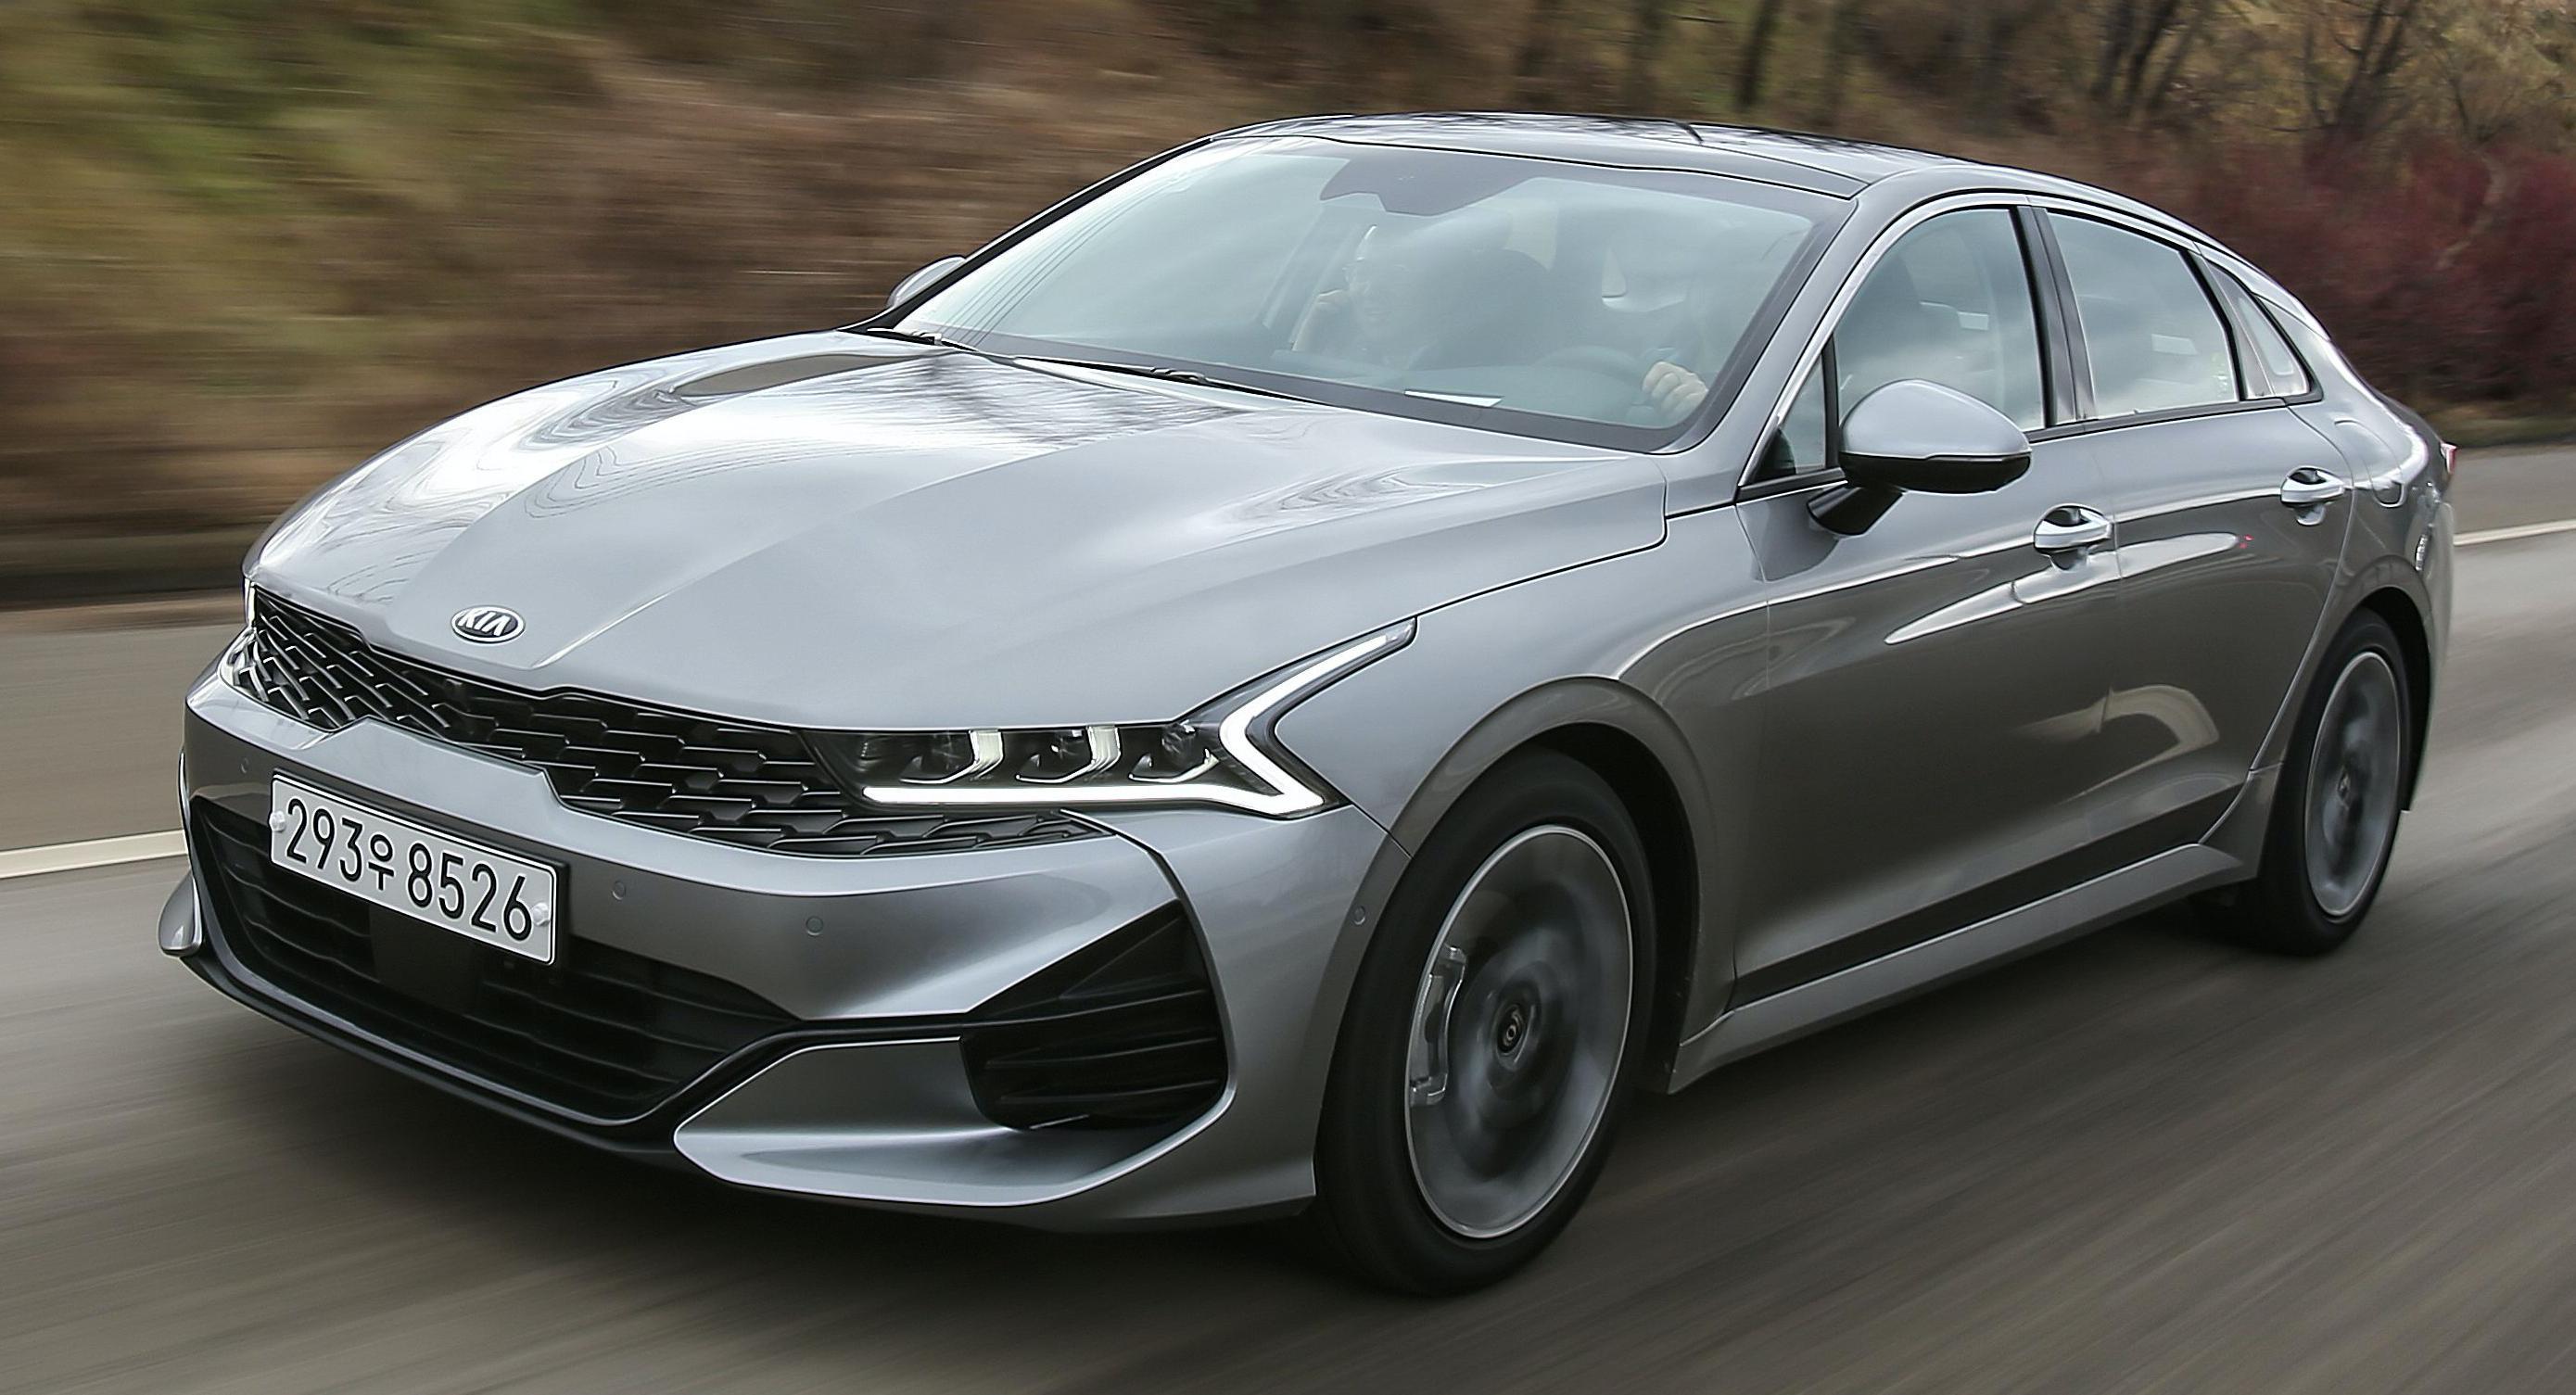 2021 Kia Optima Hybrid Speed Test